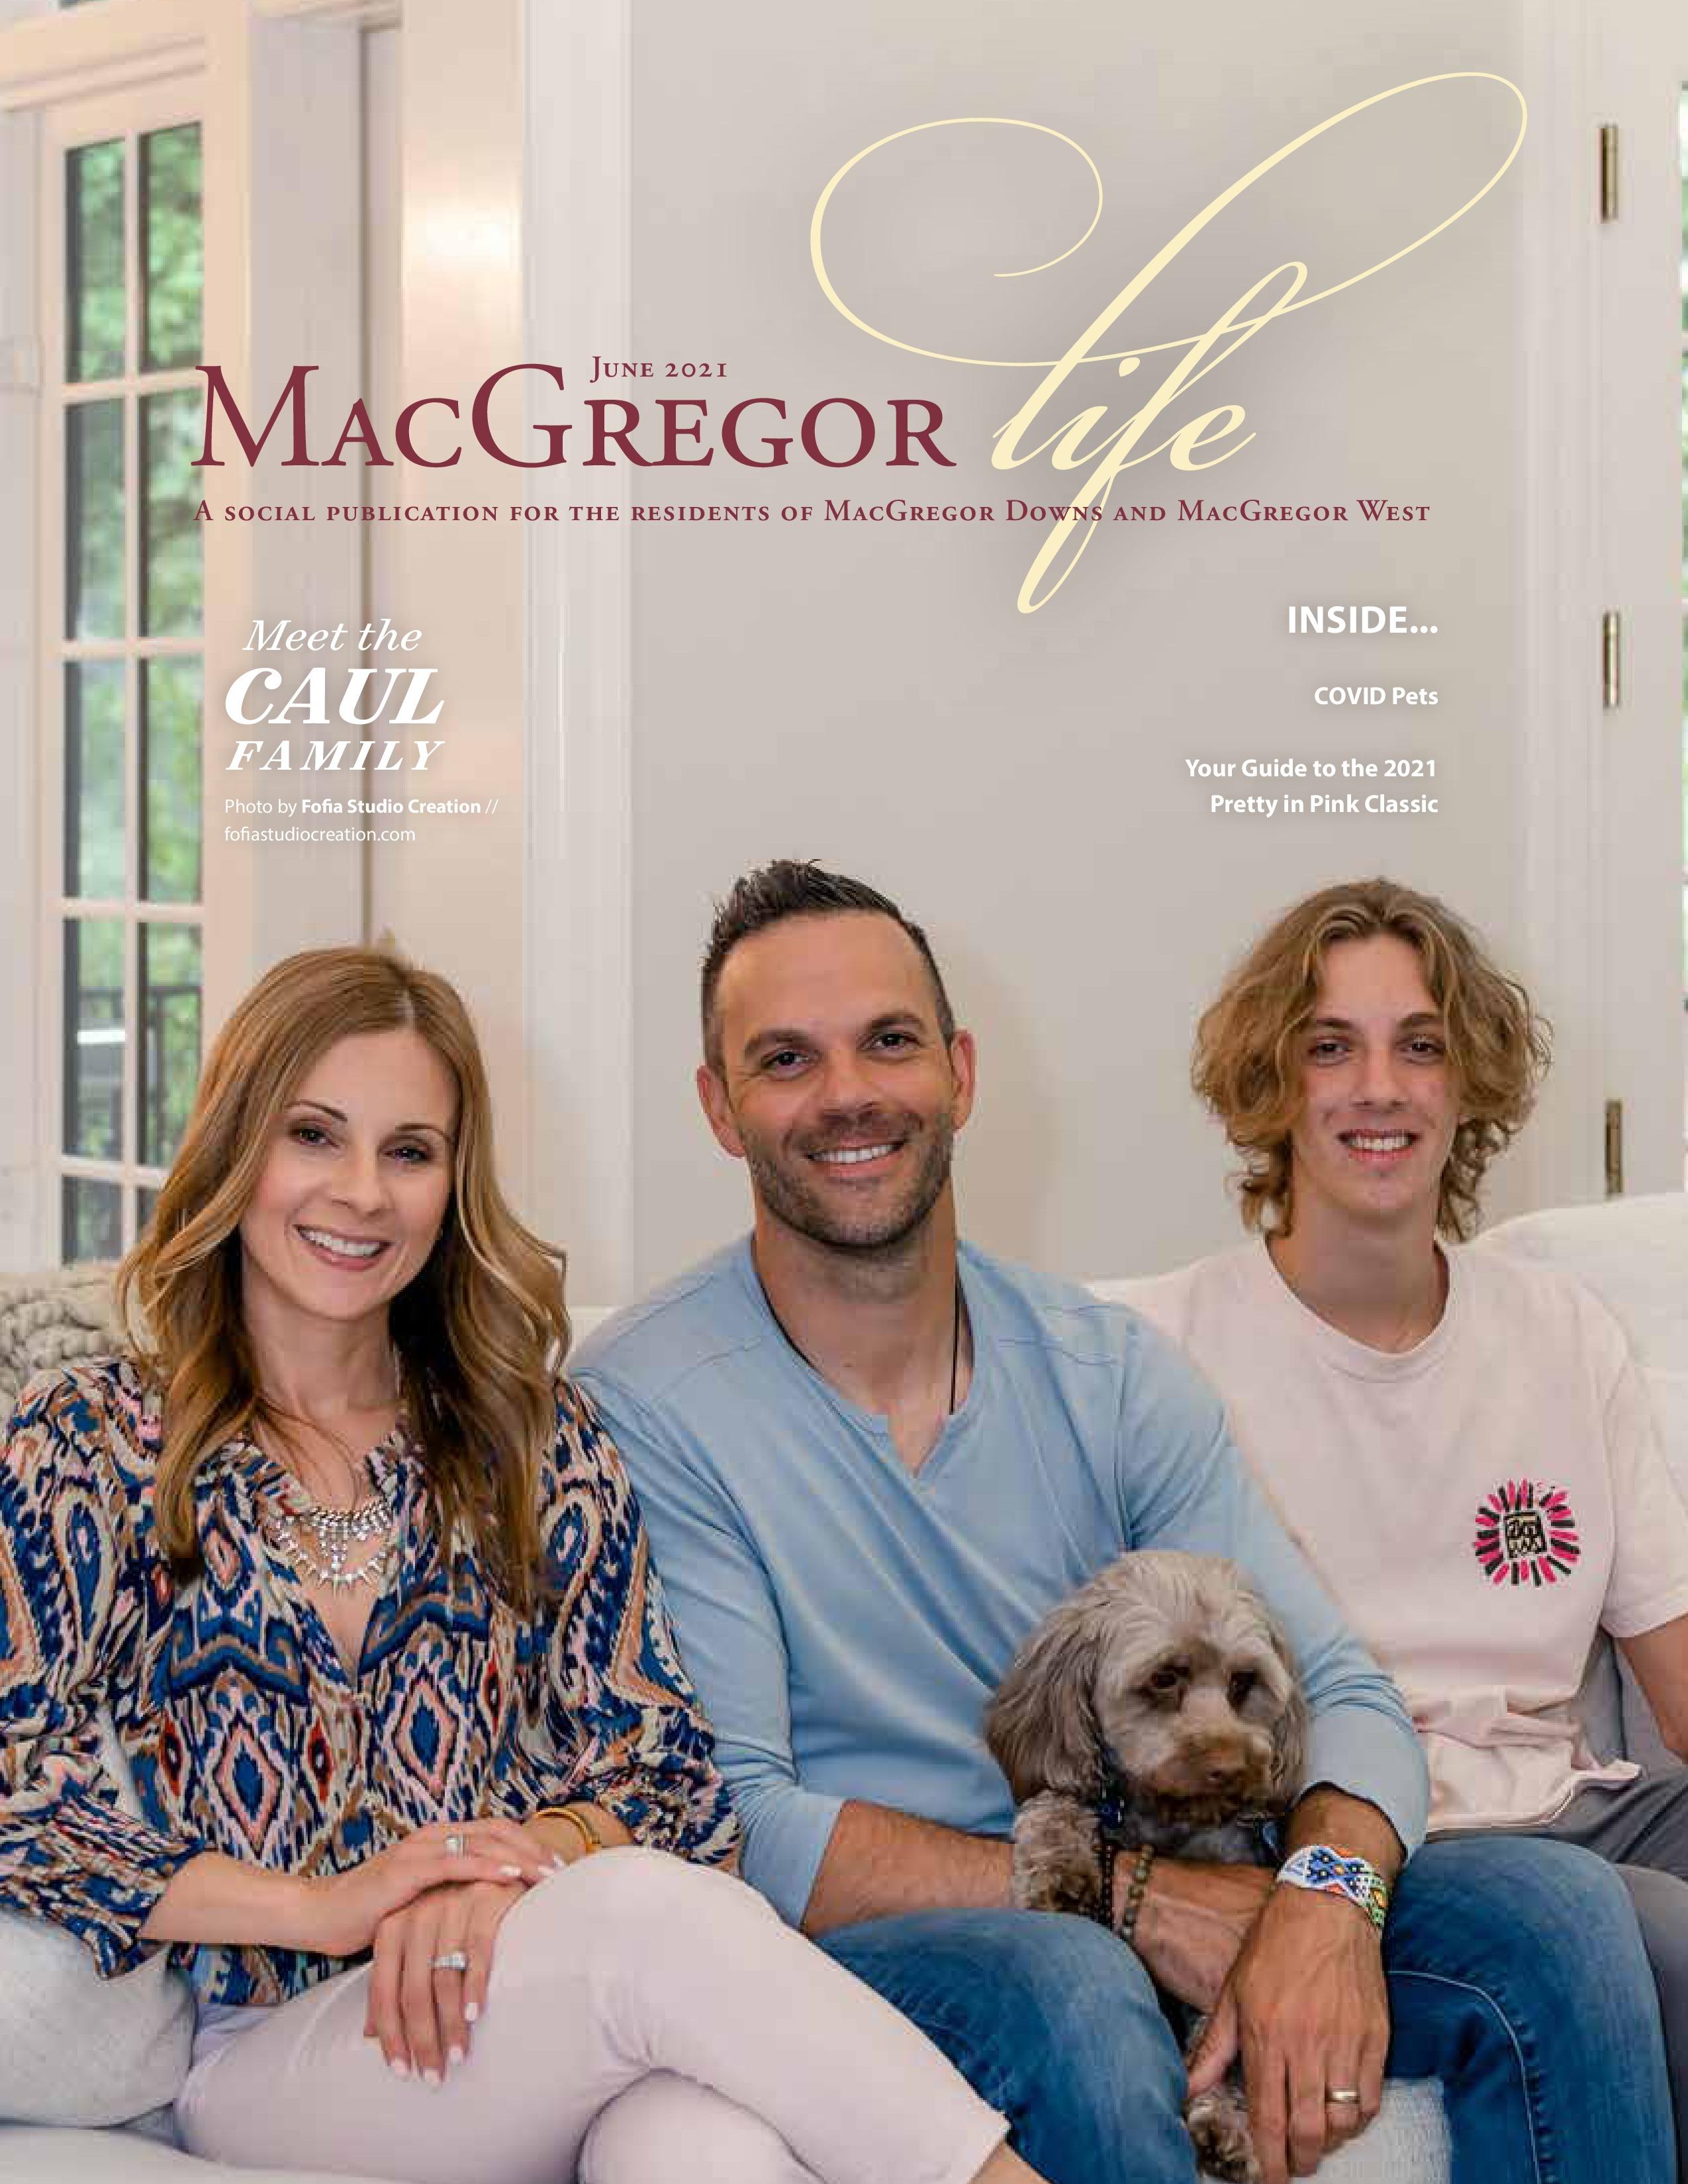 Macgregor Life 2021-06-01